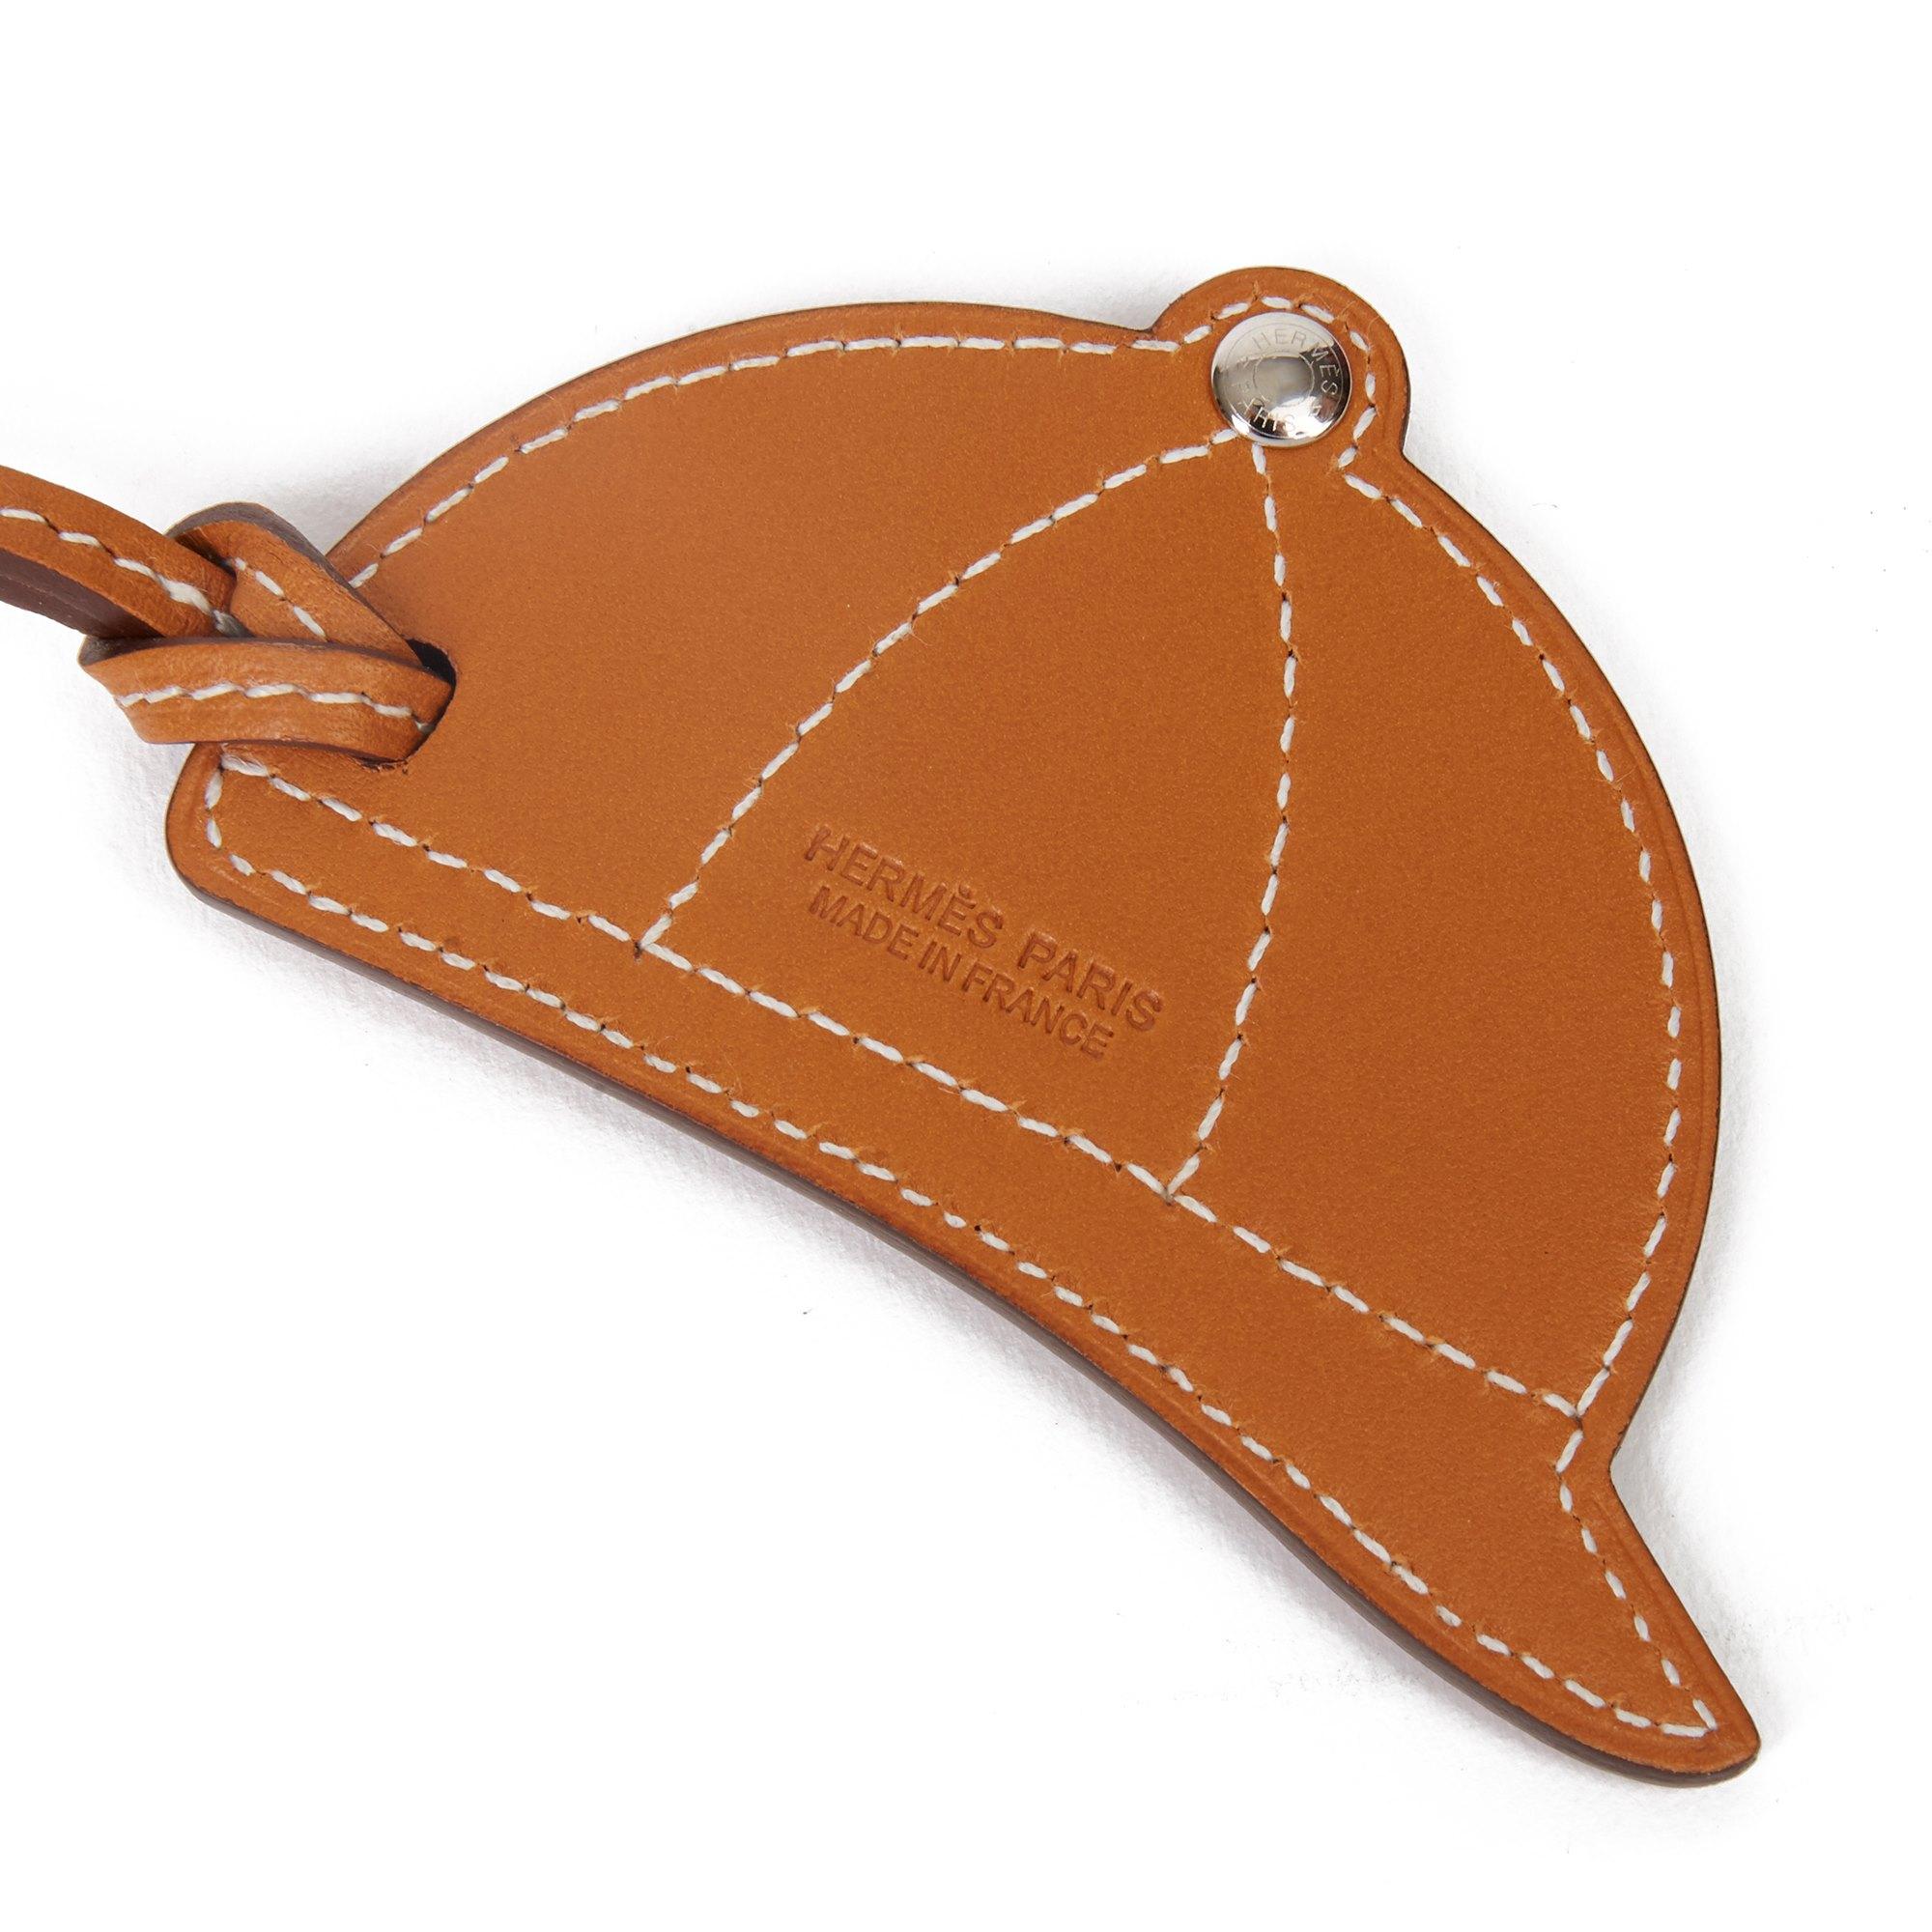 Hermès Natural Butler Leather & Capucine, Bleu du Nord Swift Leather Paddock Bombe Charm